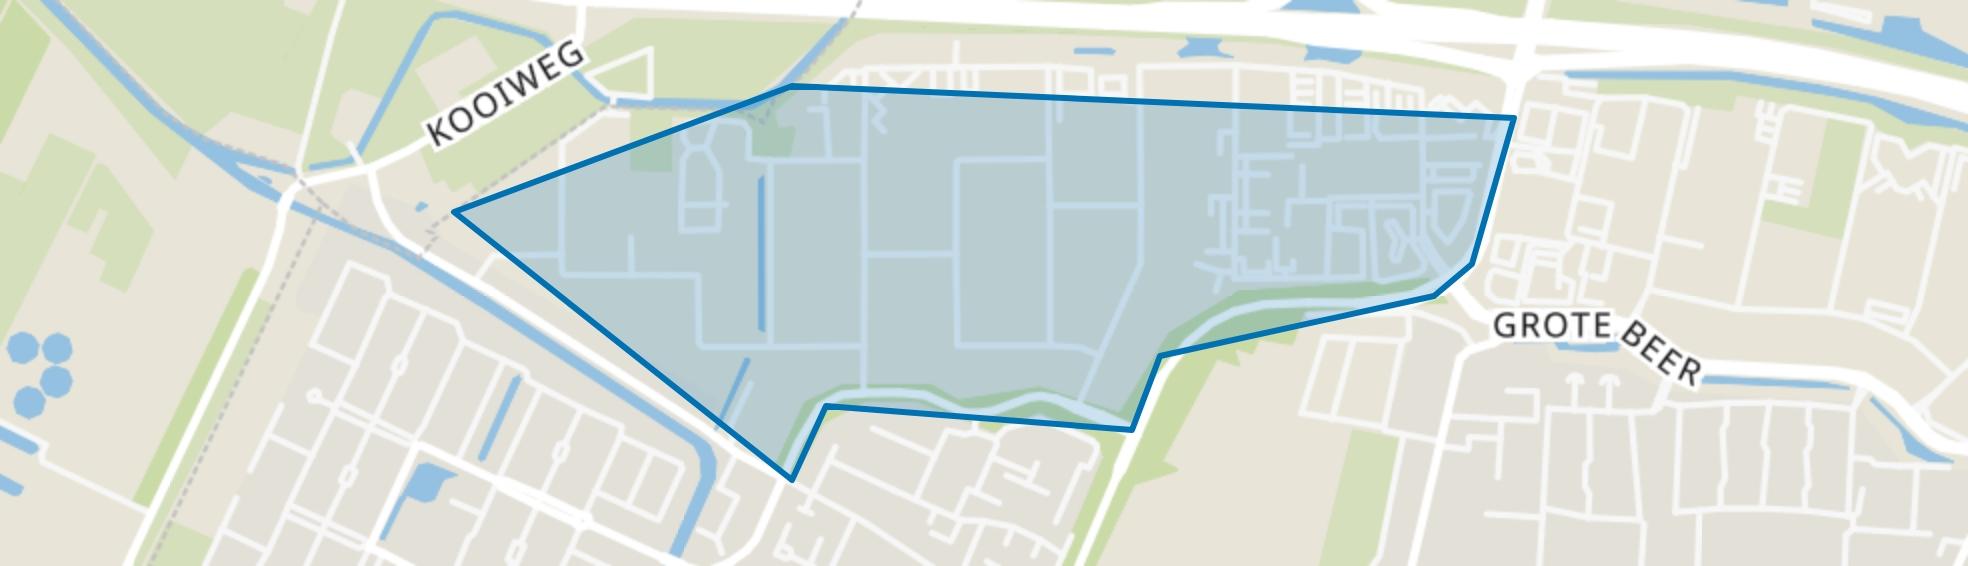 De Faktorij en De Vendel, Veenendaal map